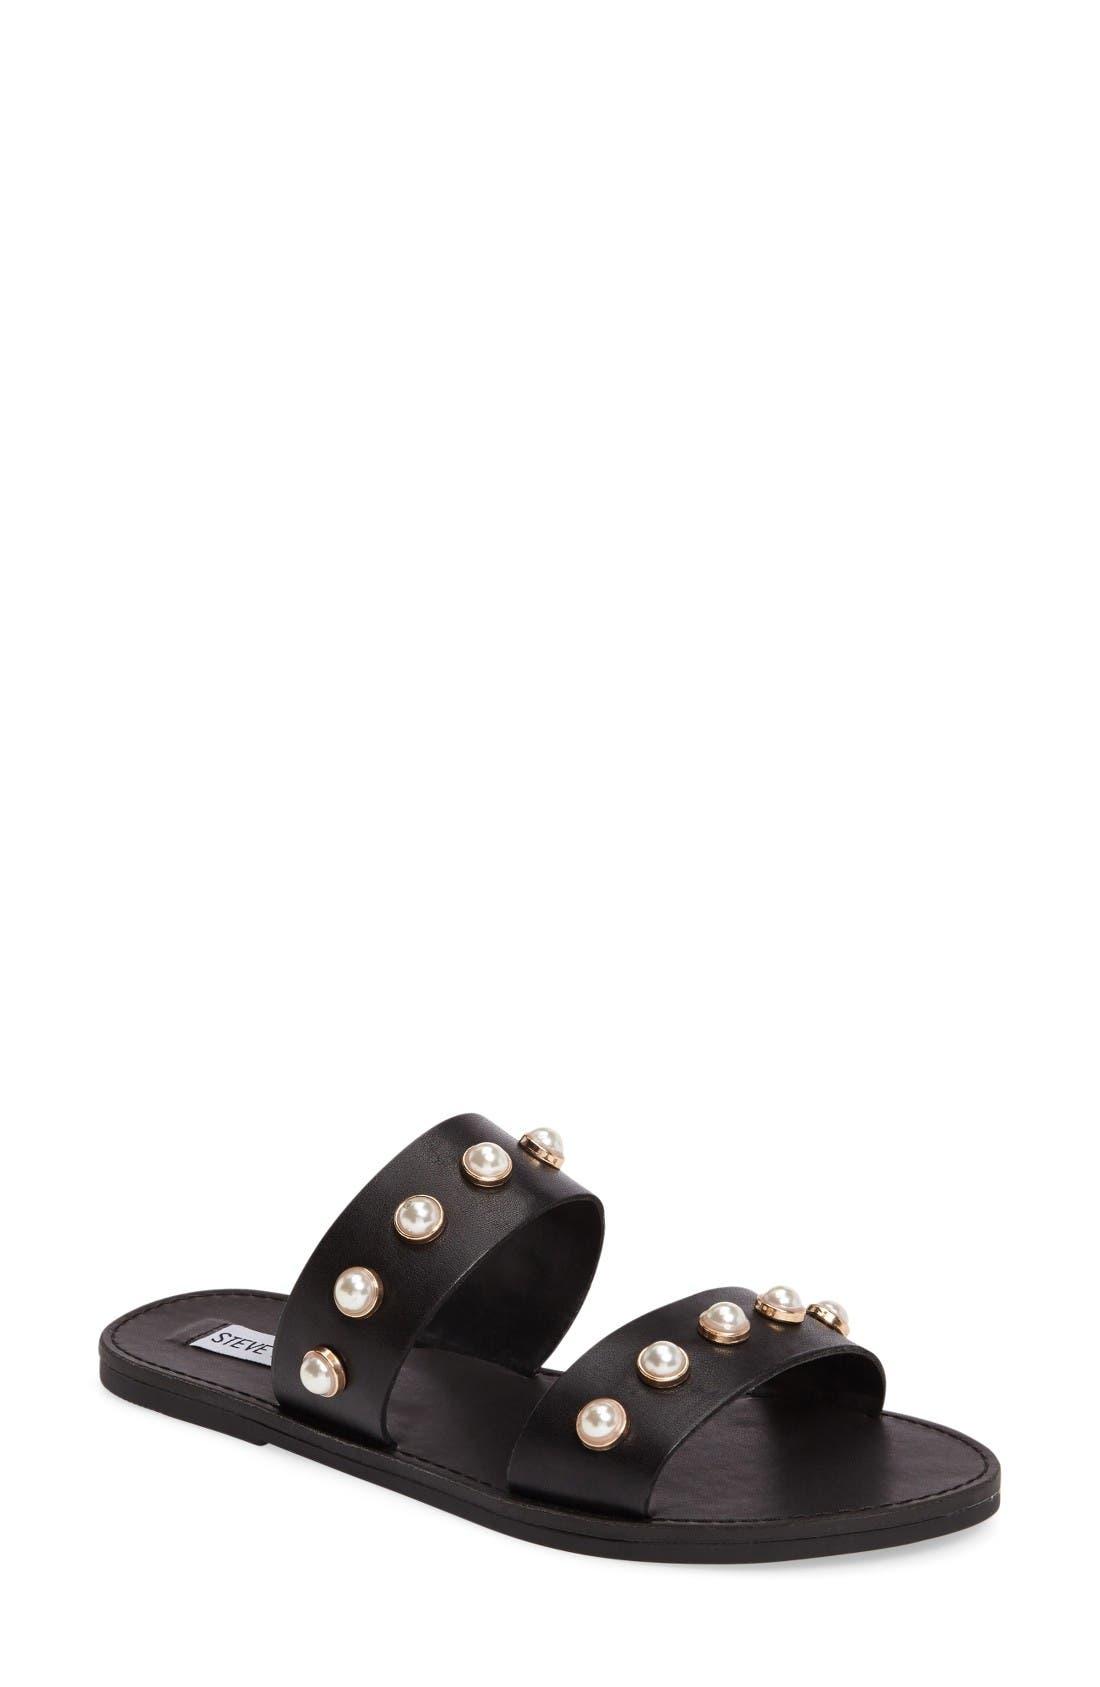 Alternate Image 1 Selected - Steve Madden Jole Embellished Slide Sandal (Women)